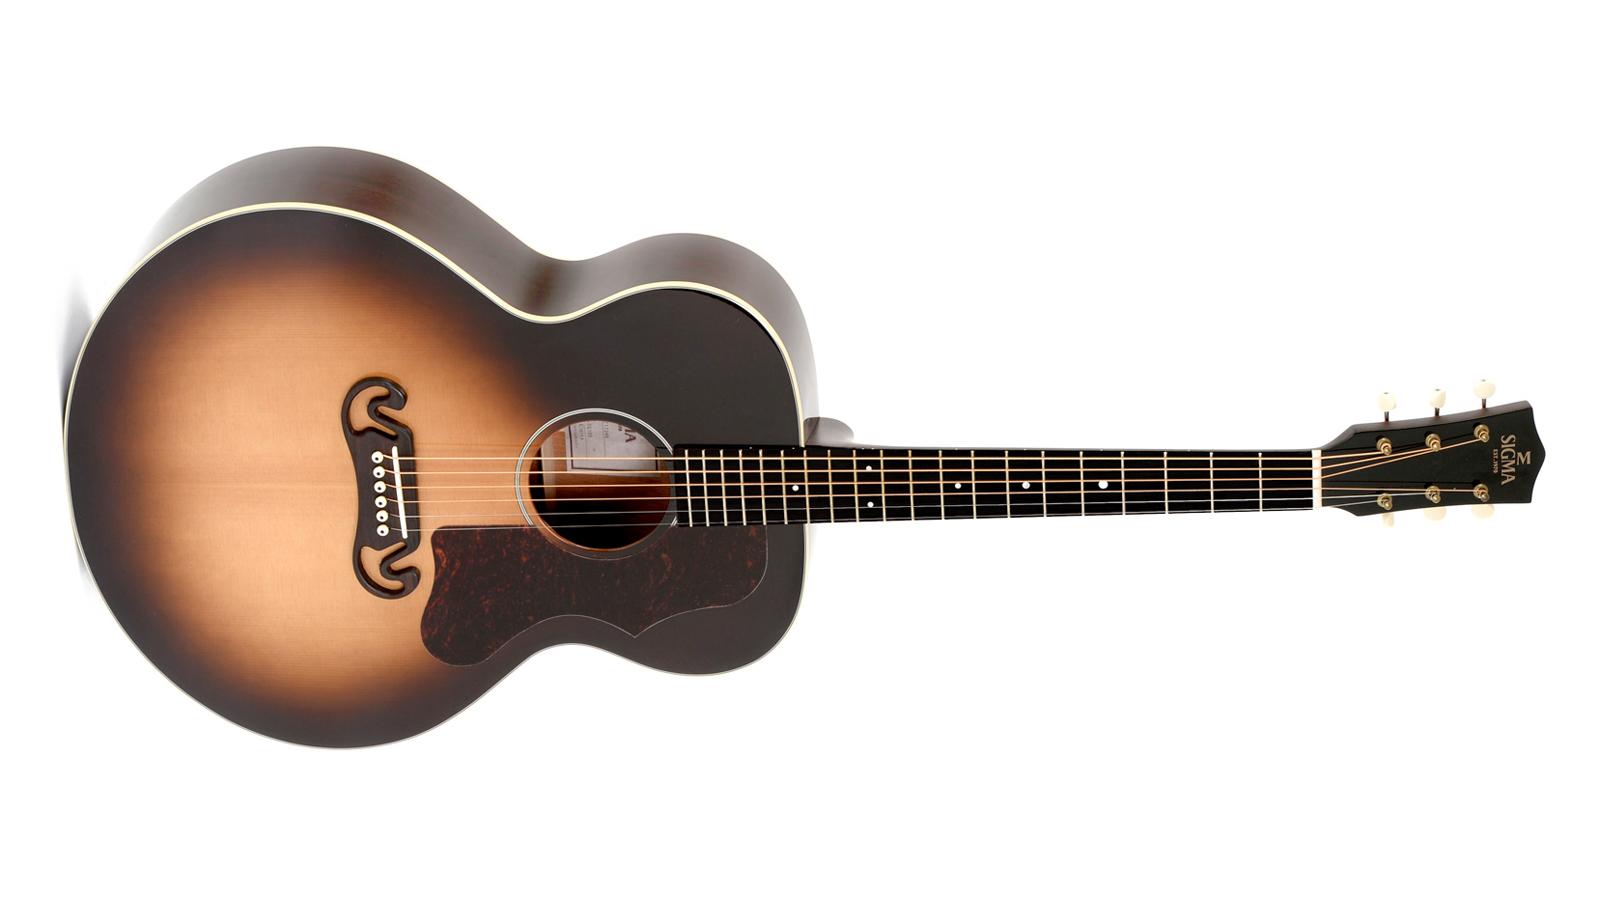 Sigma GJM-SG100+ Westerngitarre